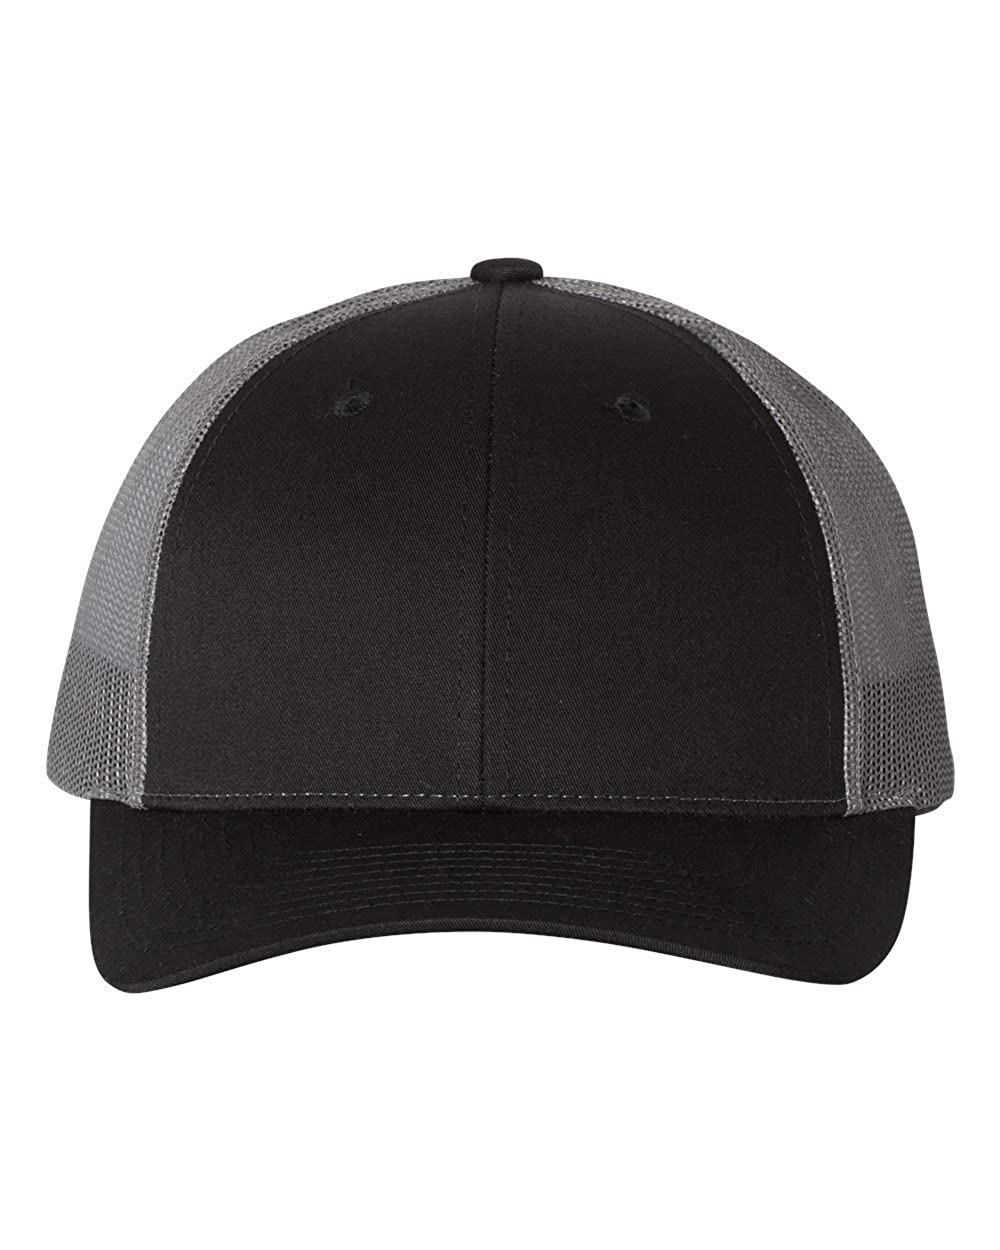 3e26df0ee8c Amazon.com  Richardson 115 LOW PRO TRUCKER BLANK BASEBALL CAP HAT  Clothing